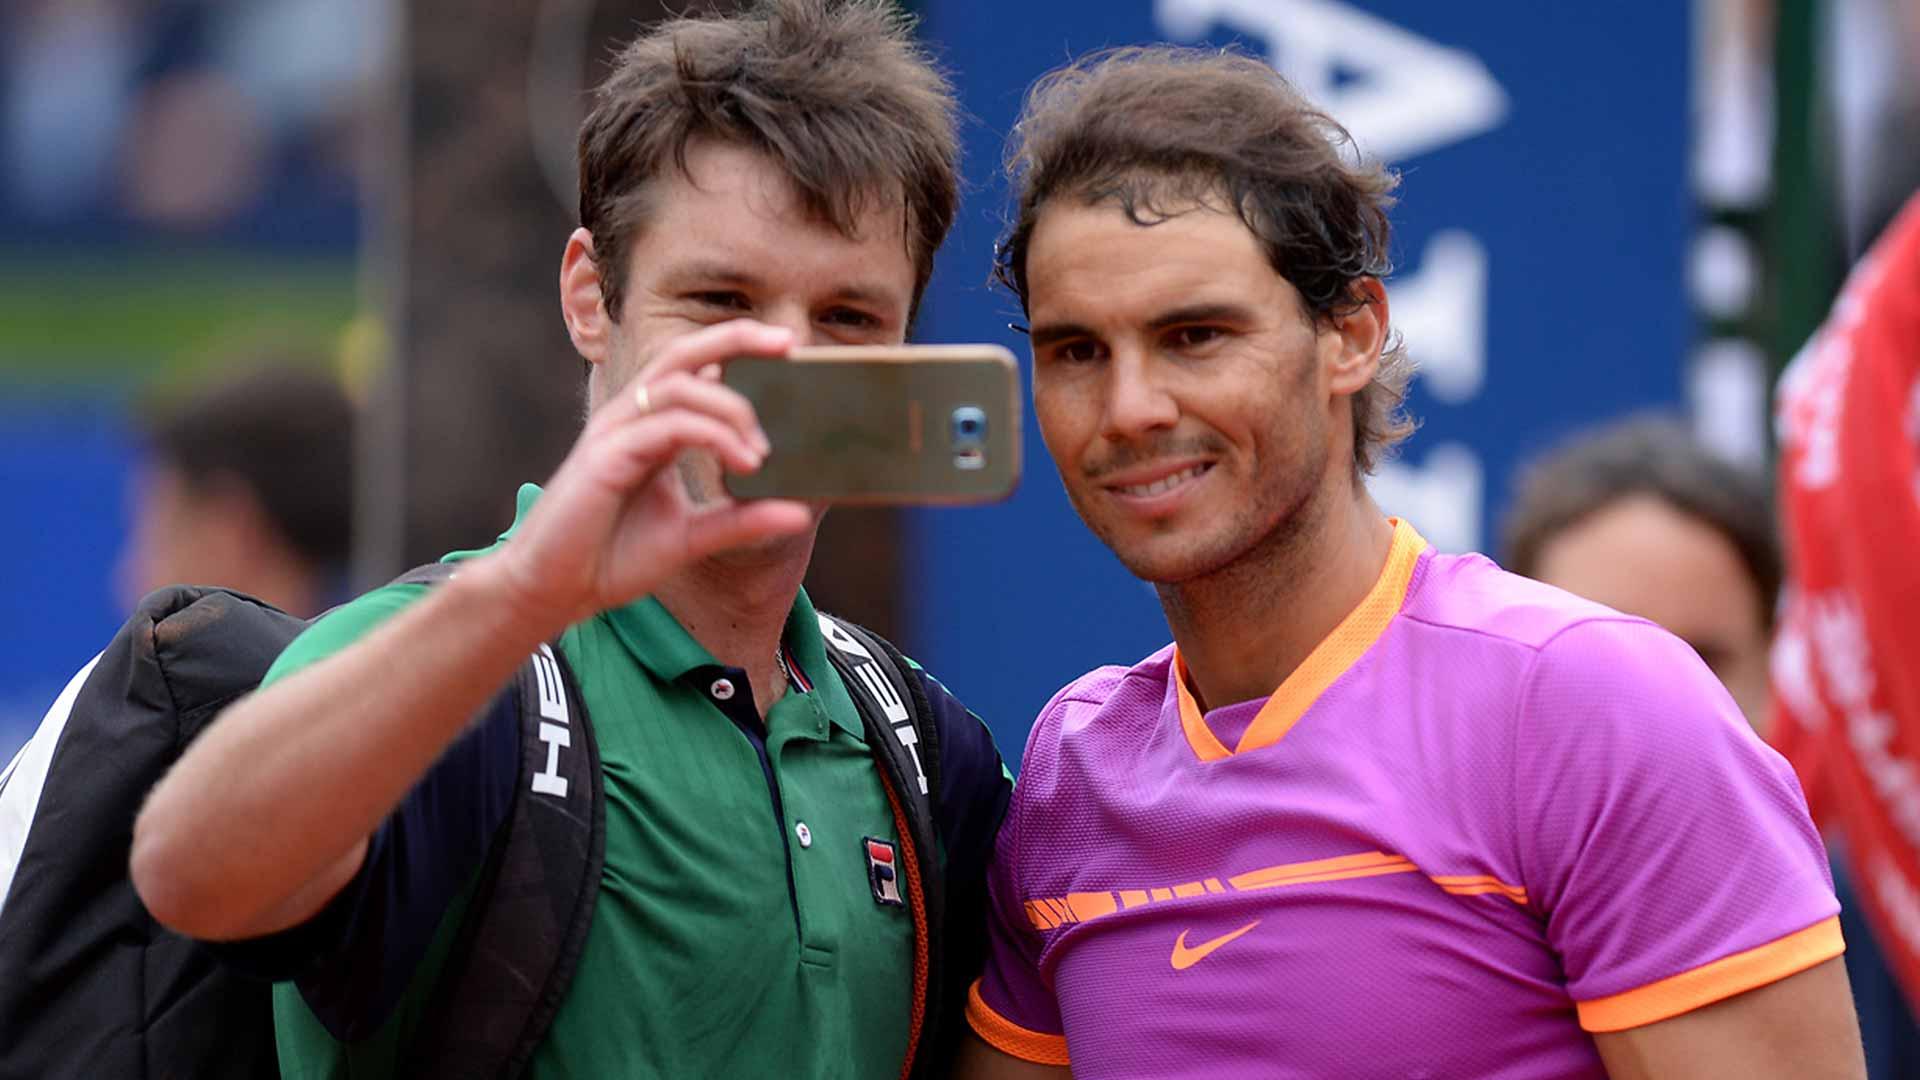 Nadal Wikipedia: Despite Losing, Zeballos Gets His Nadal Selfie In